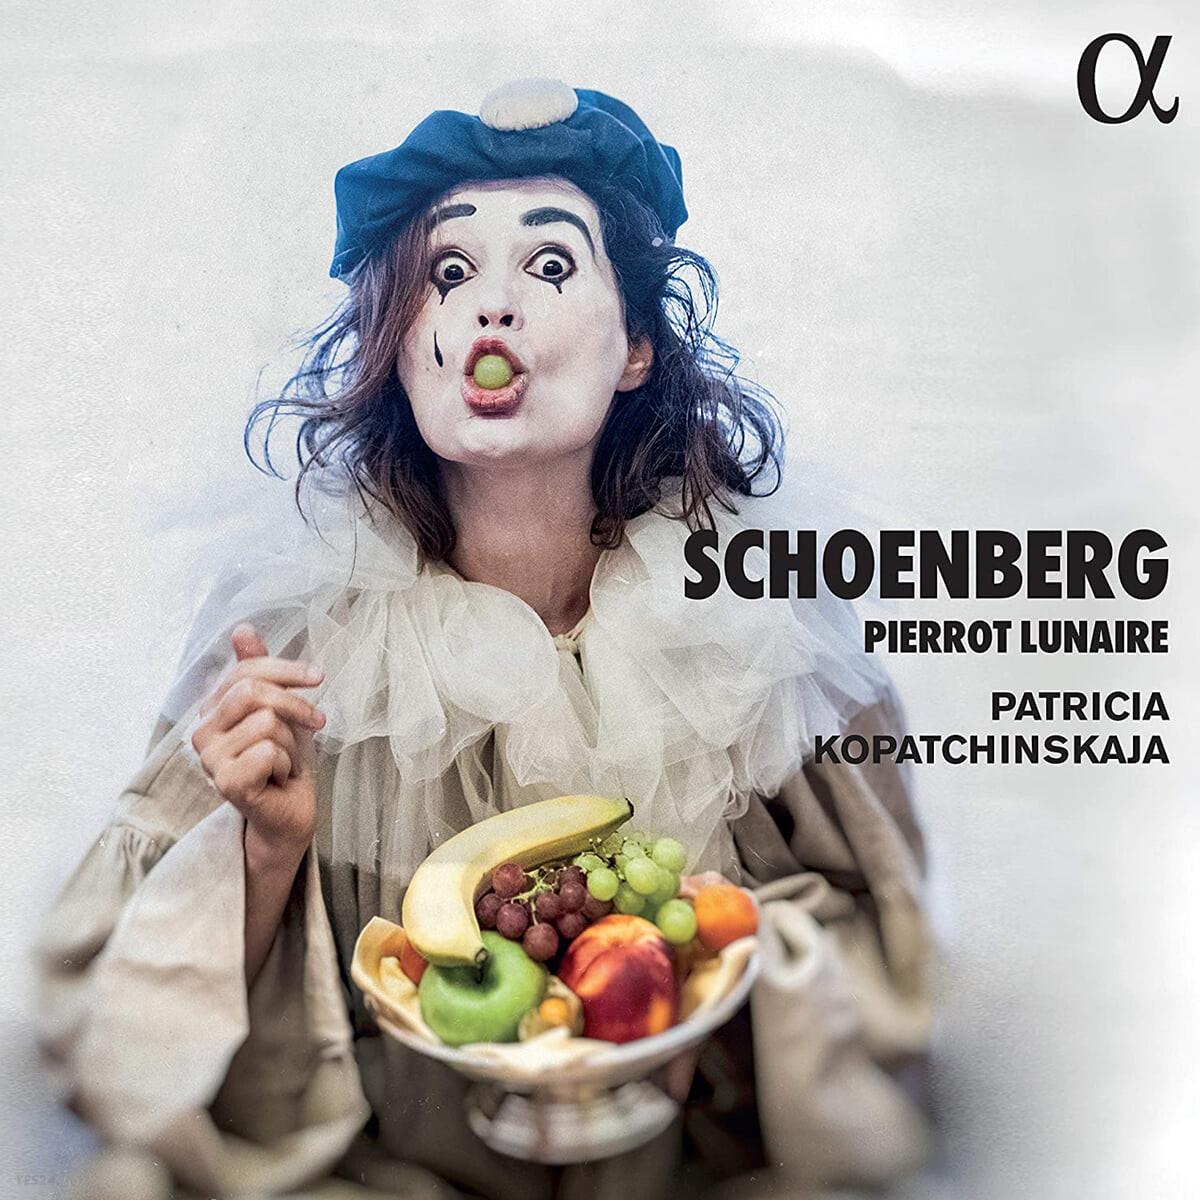 Patricia Kopatchinskaja 쇤베르크: 달에 홀린 삐에로 (Schoenberg: Pierrot lunaire)